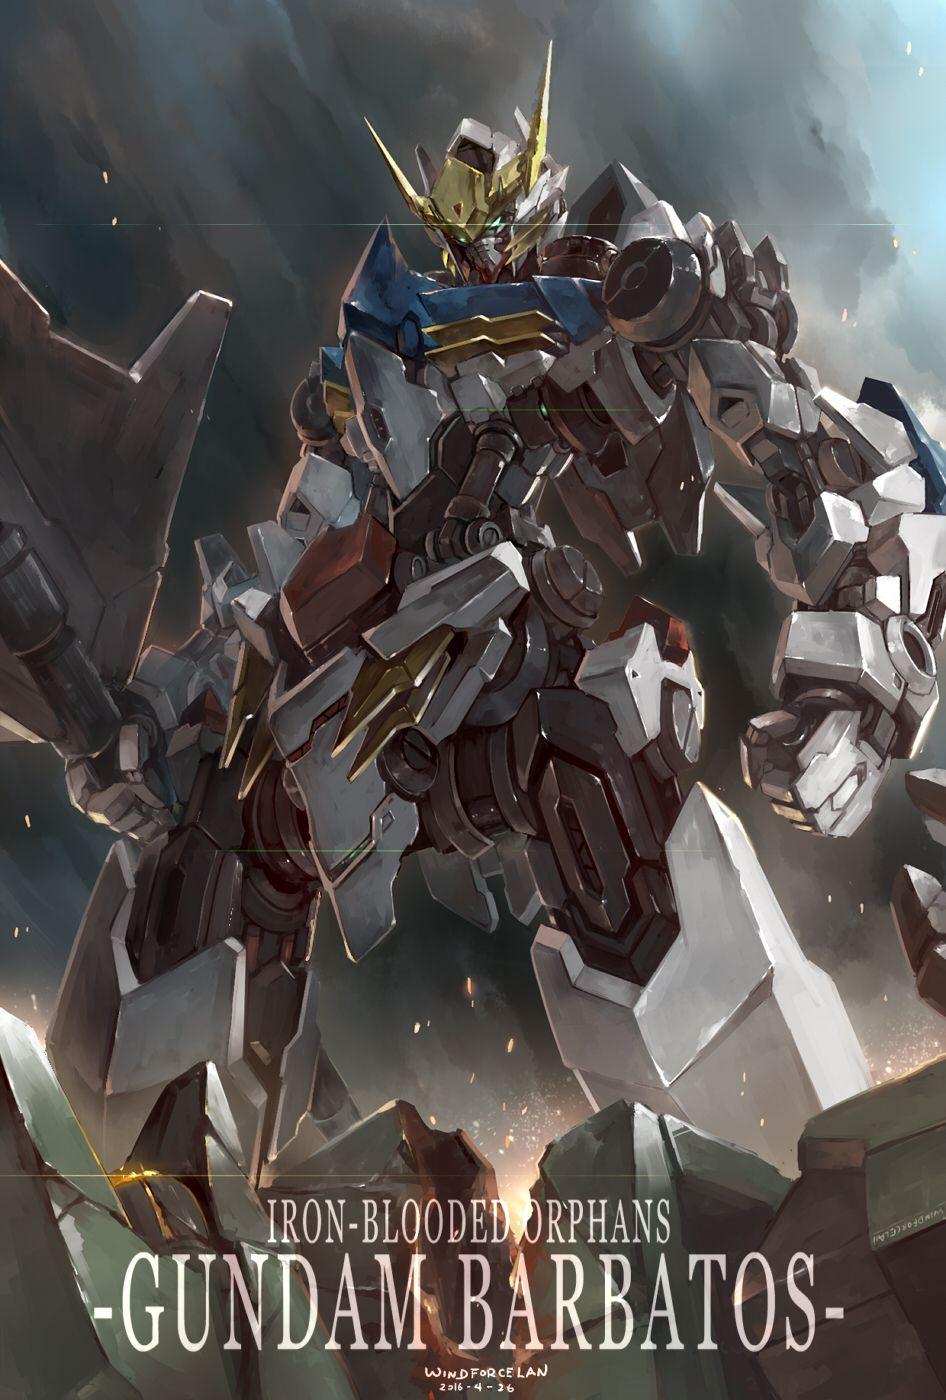 Gundam Guy Awesome Gundam Digital Artworks Updated 5 5 16 Gundam Gundam Iron Blooded Orphans Gundam Mobile Suit